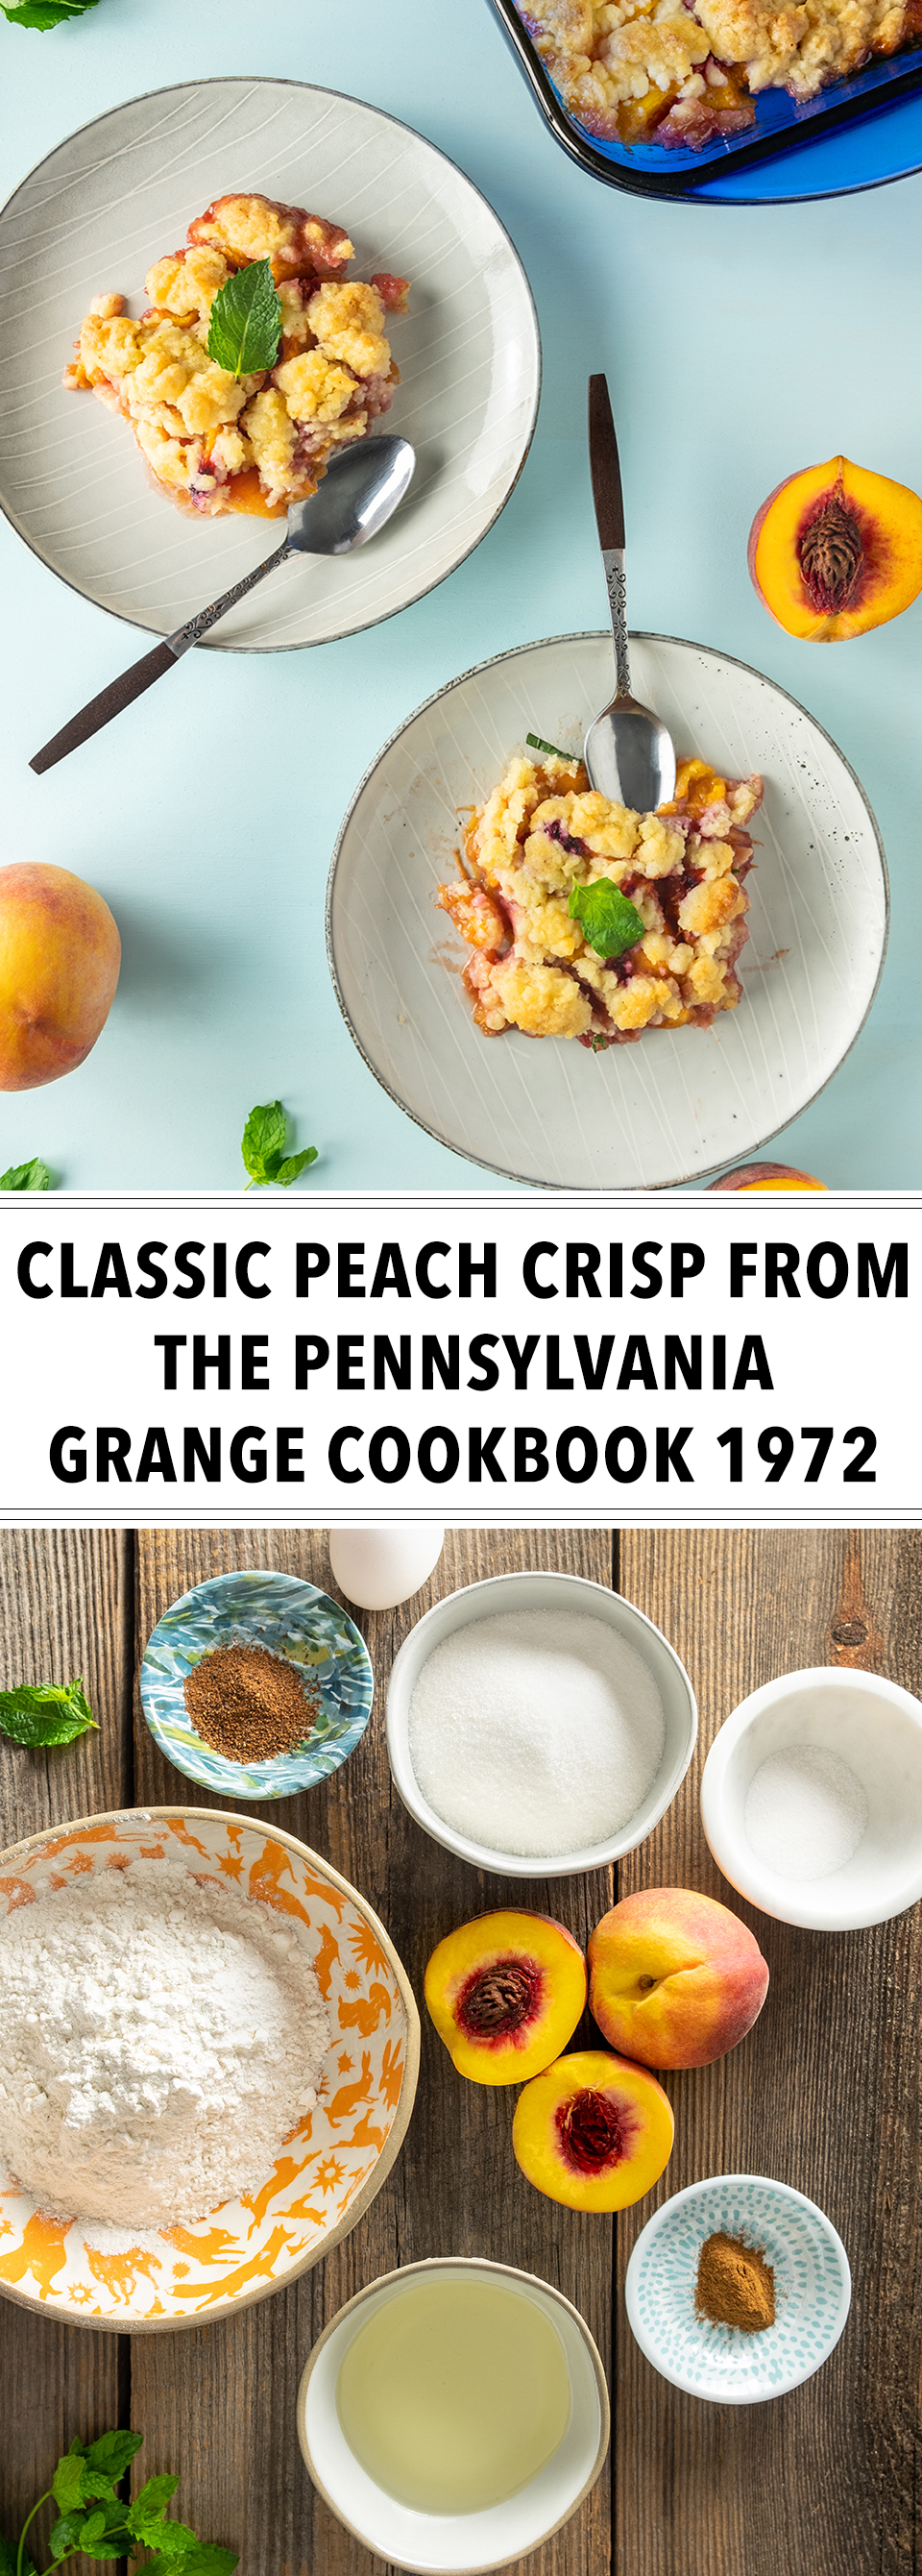 JodiLoves_Retouching_Brilliant_Pixel_Imaging-Classic-Peach-Crisp.jpg